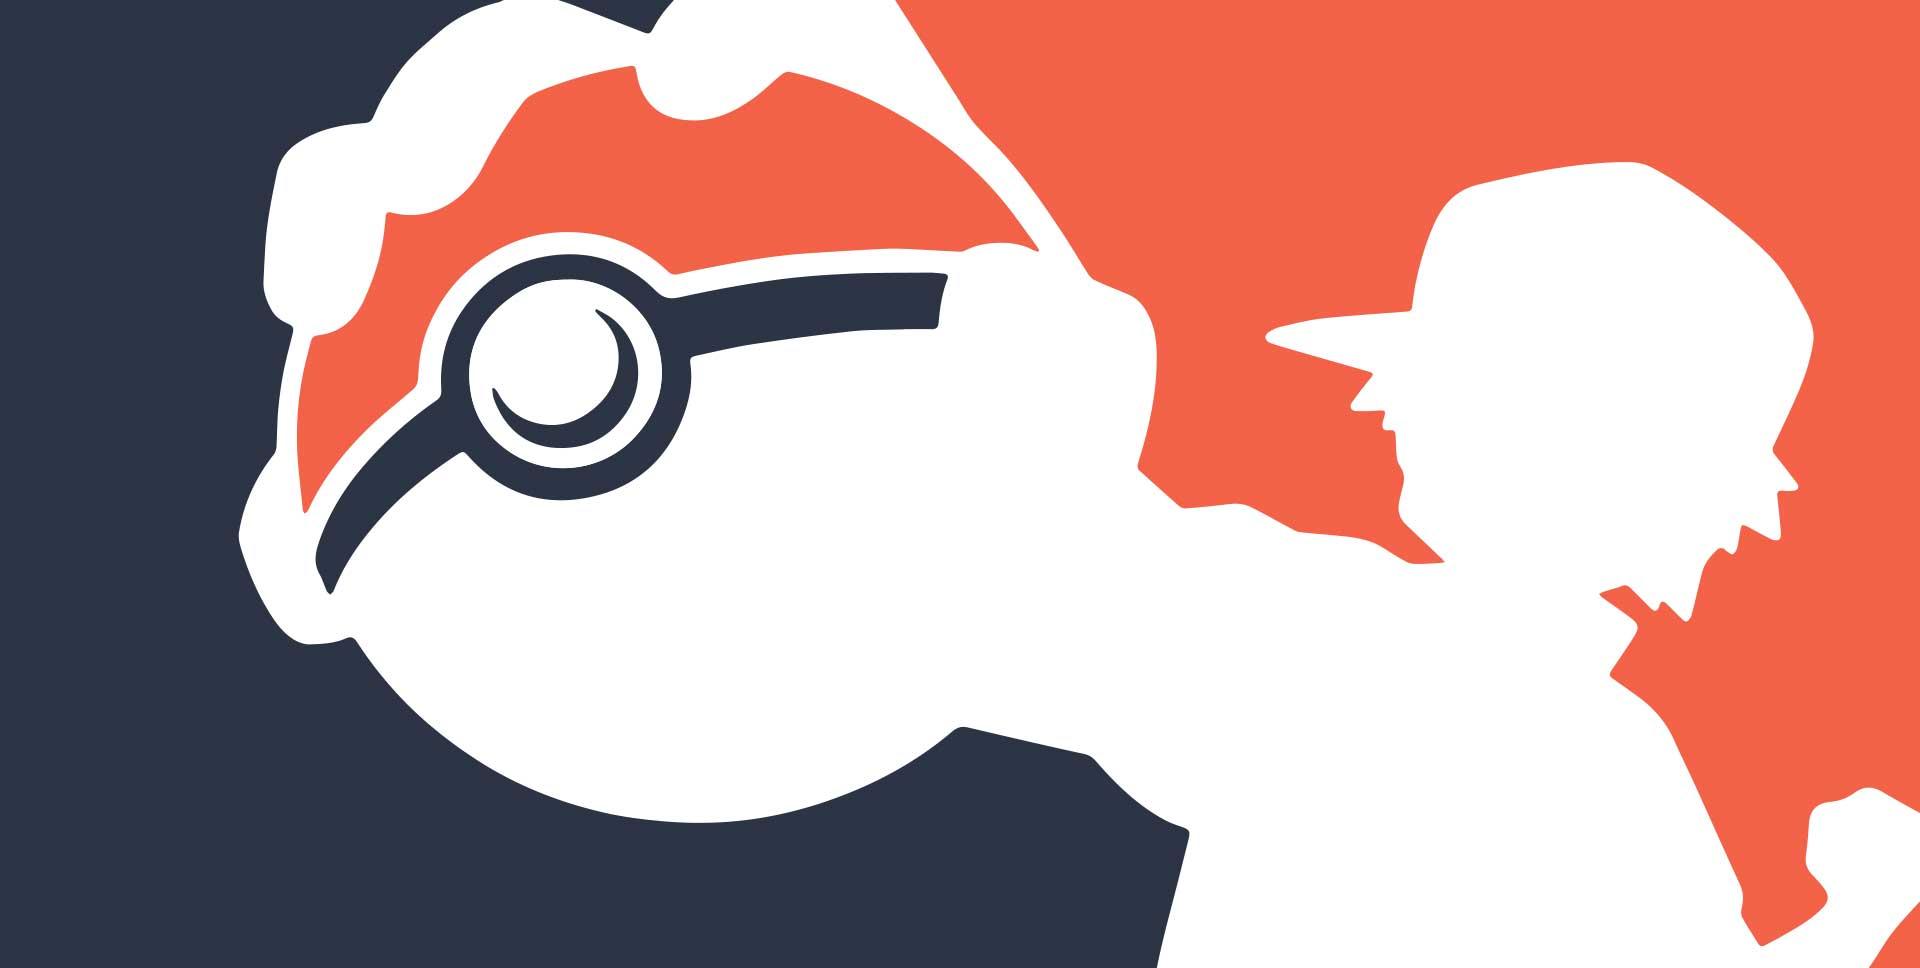 Image of Pokémon Go player, Ash, holding Pokémon ball